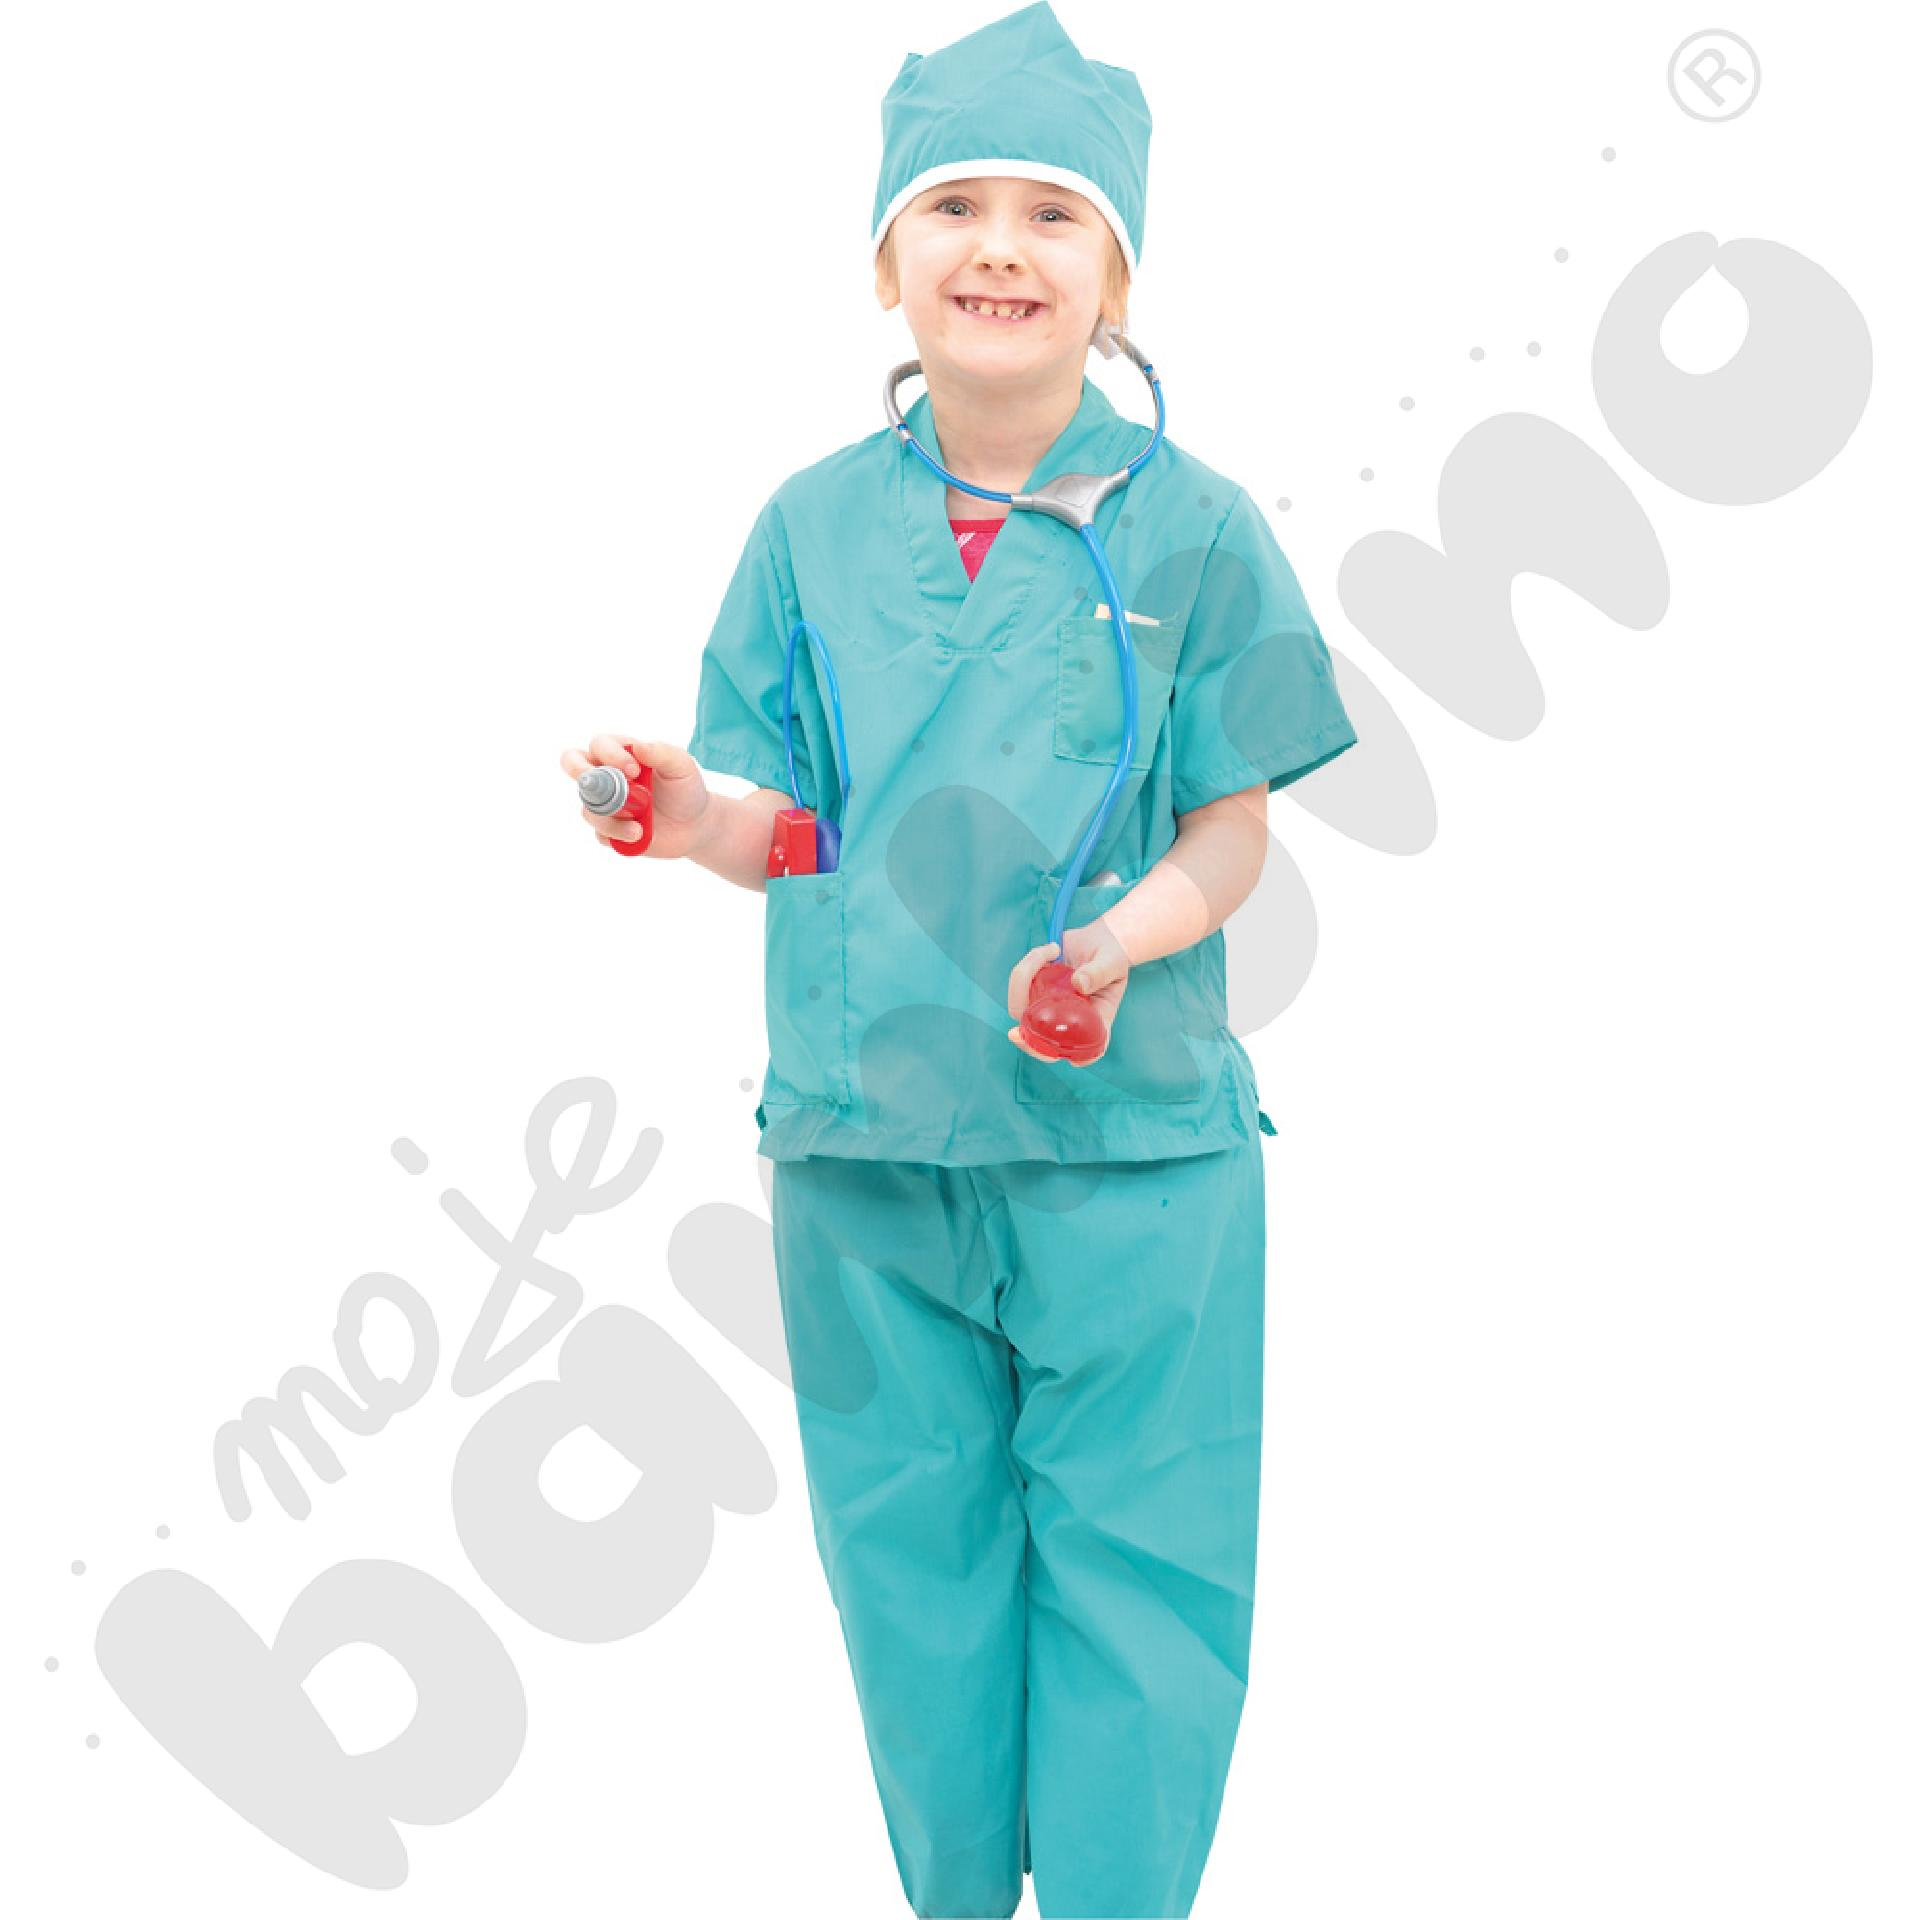 Chirurg - kostium z akcesoriami